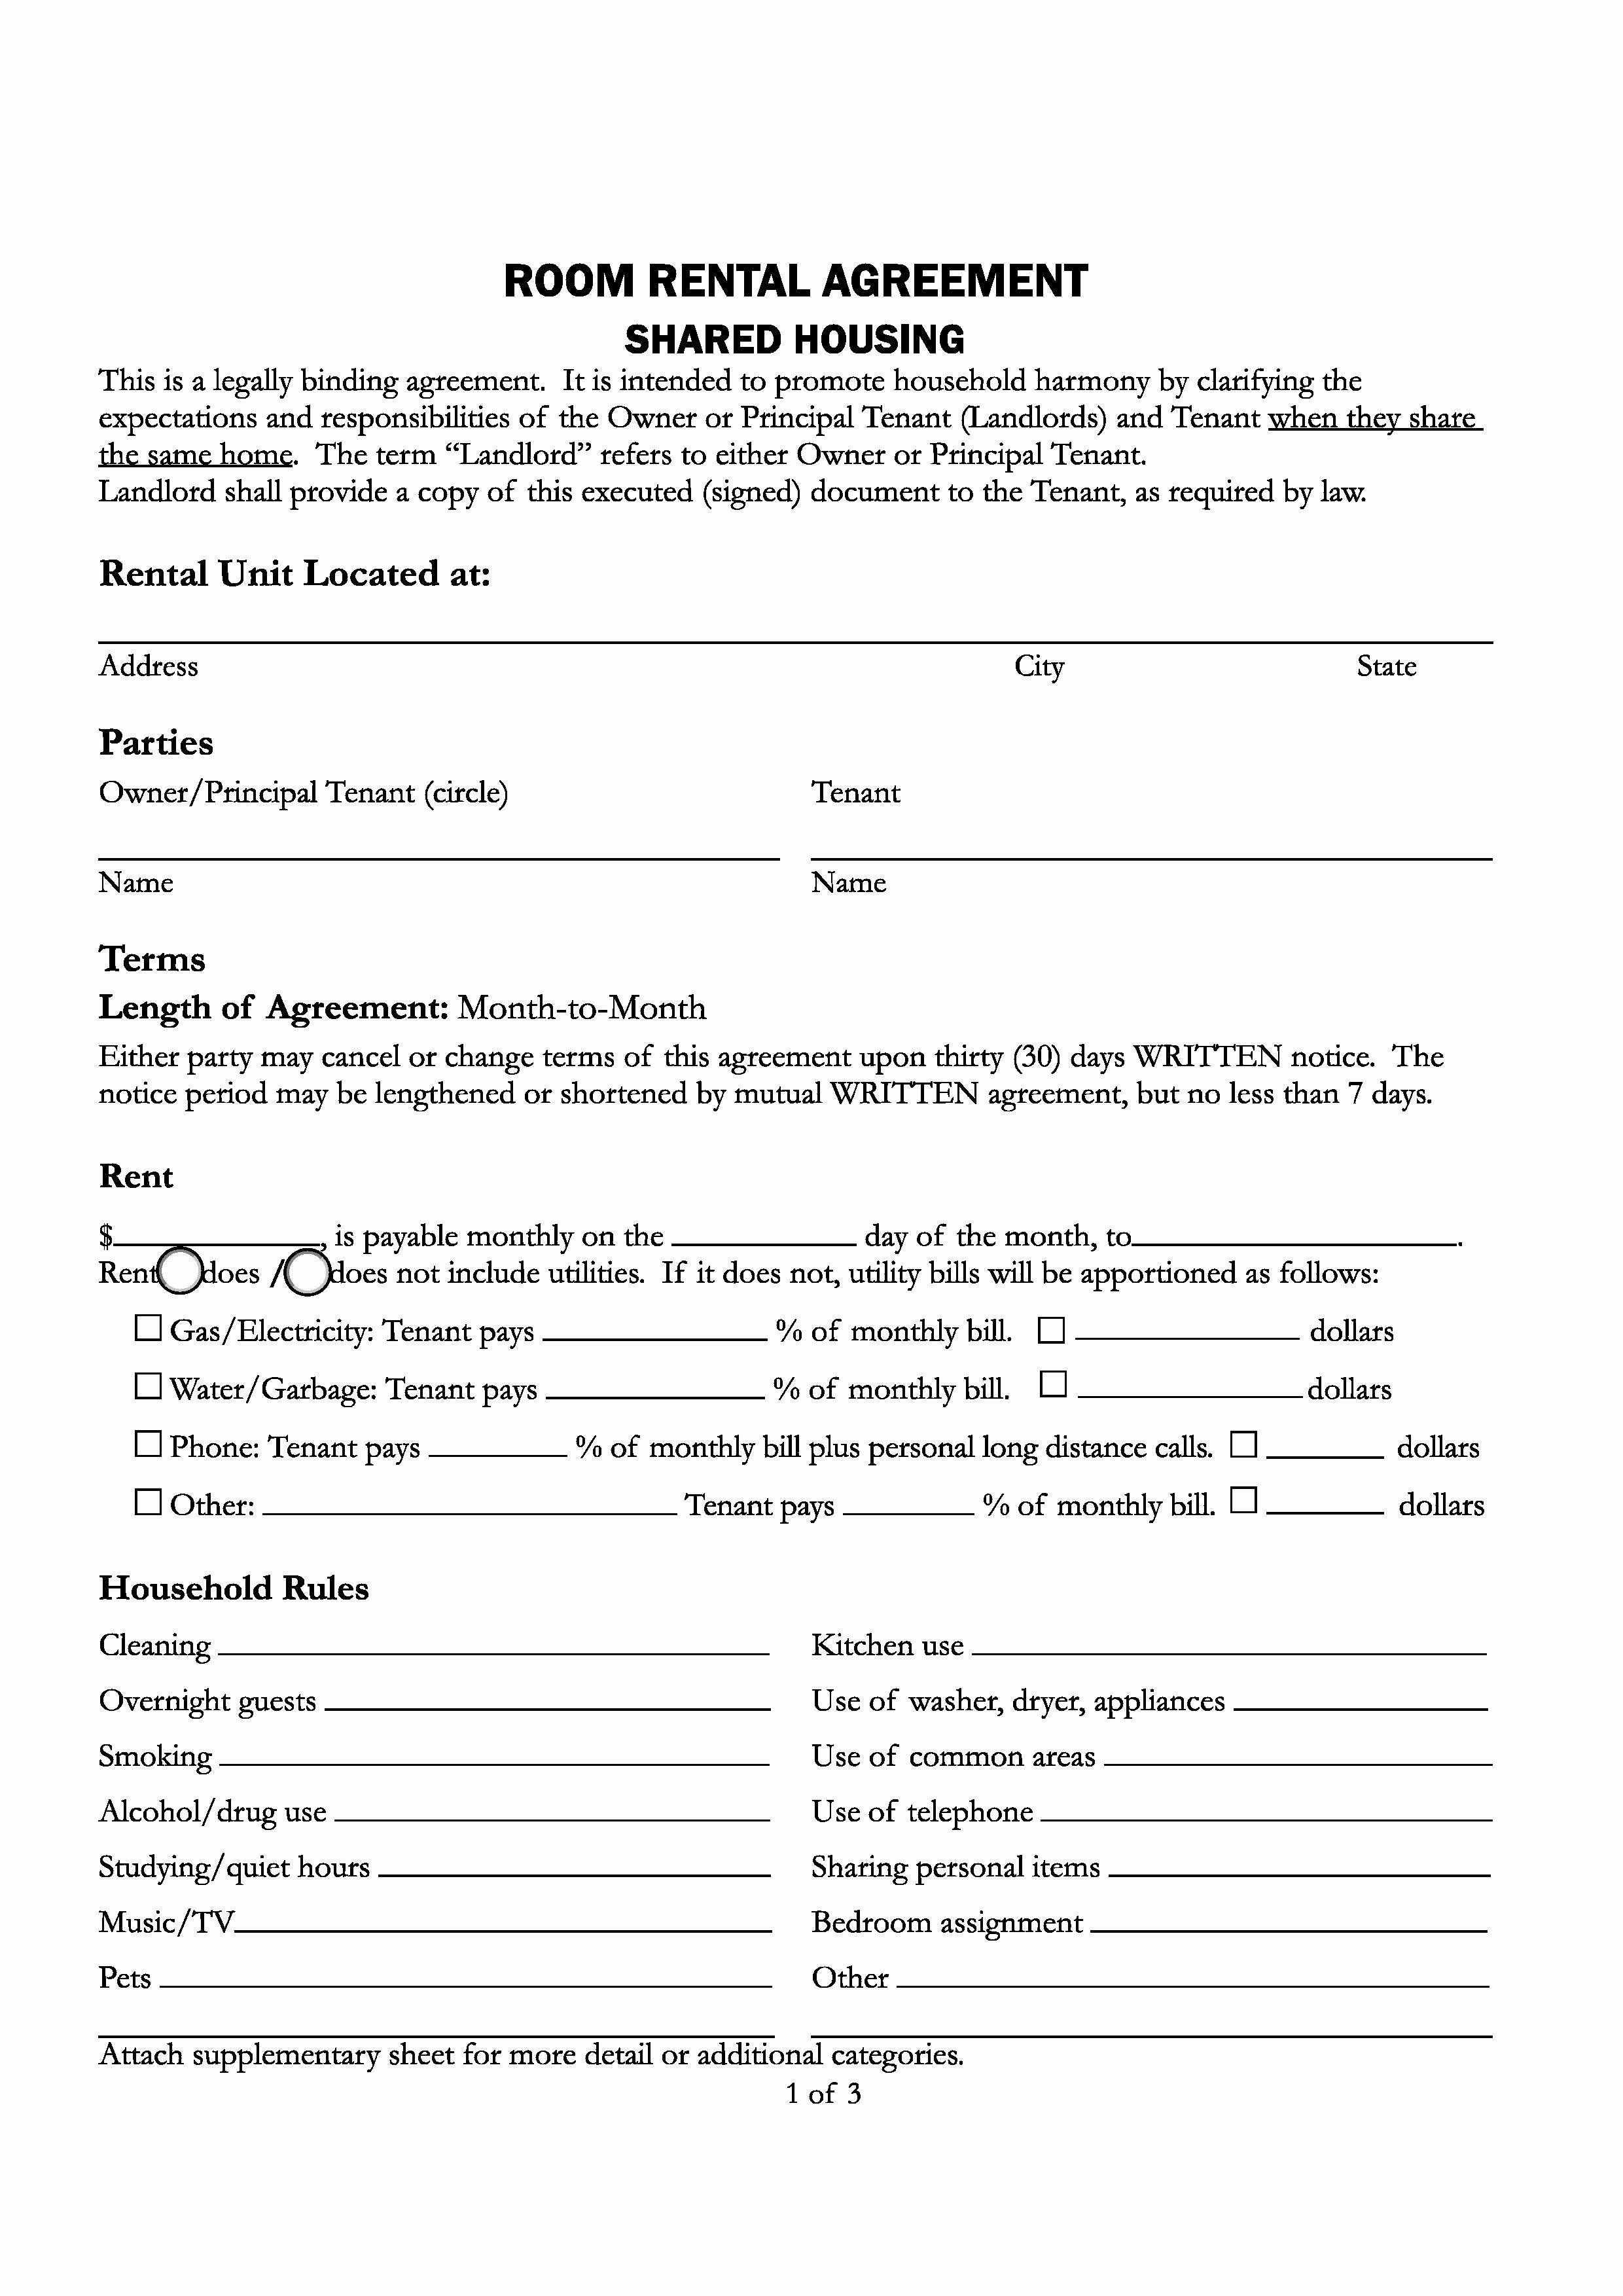 Free Santa Cruz County California Room Rental Agreement